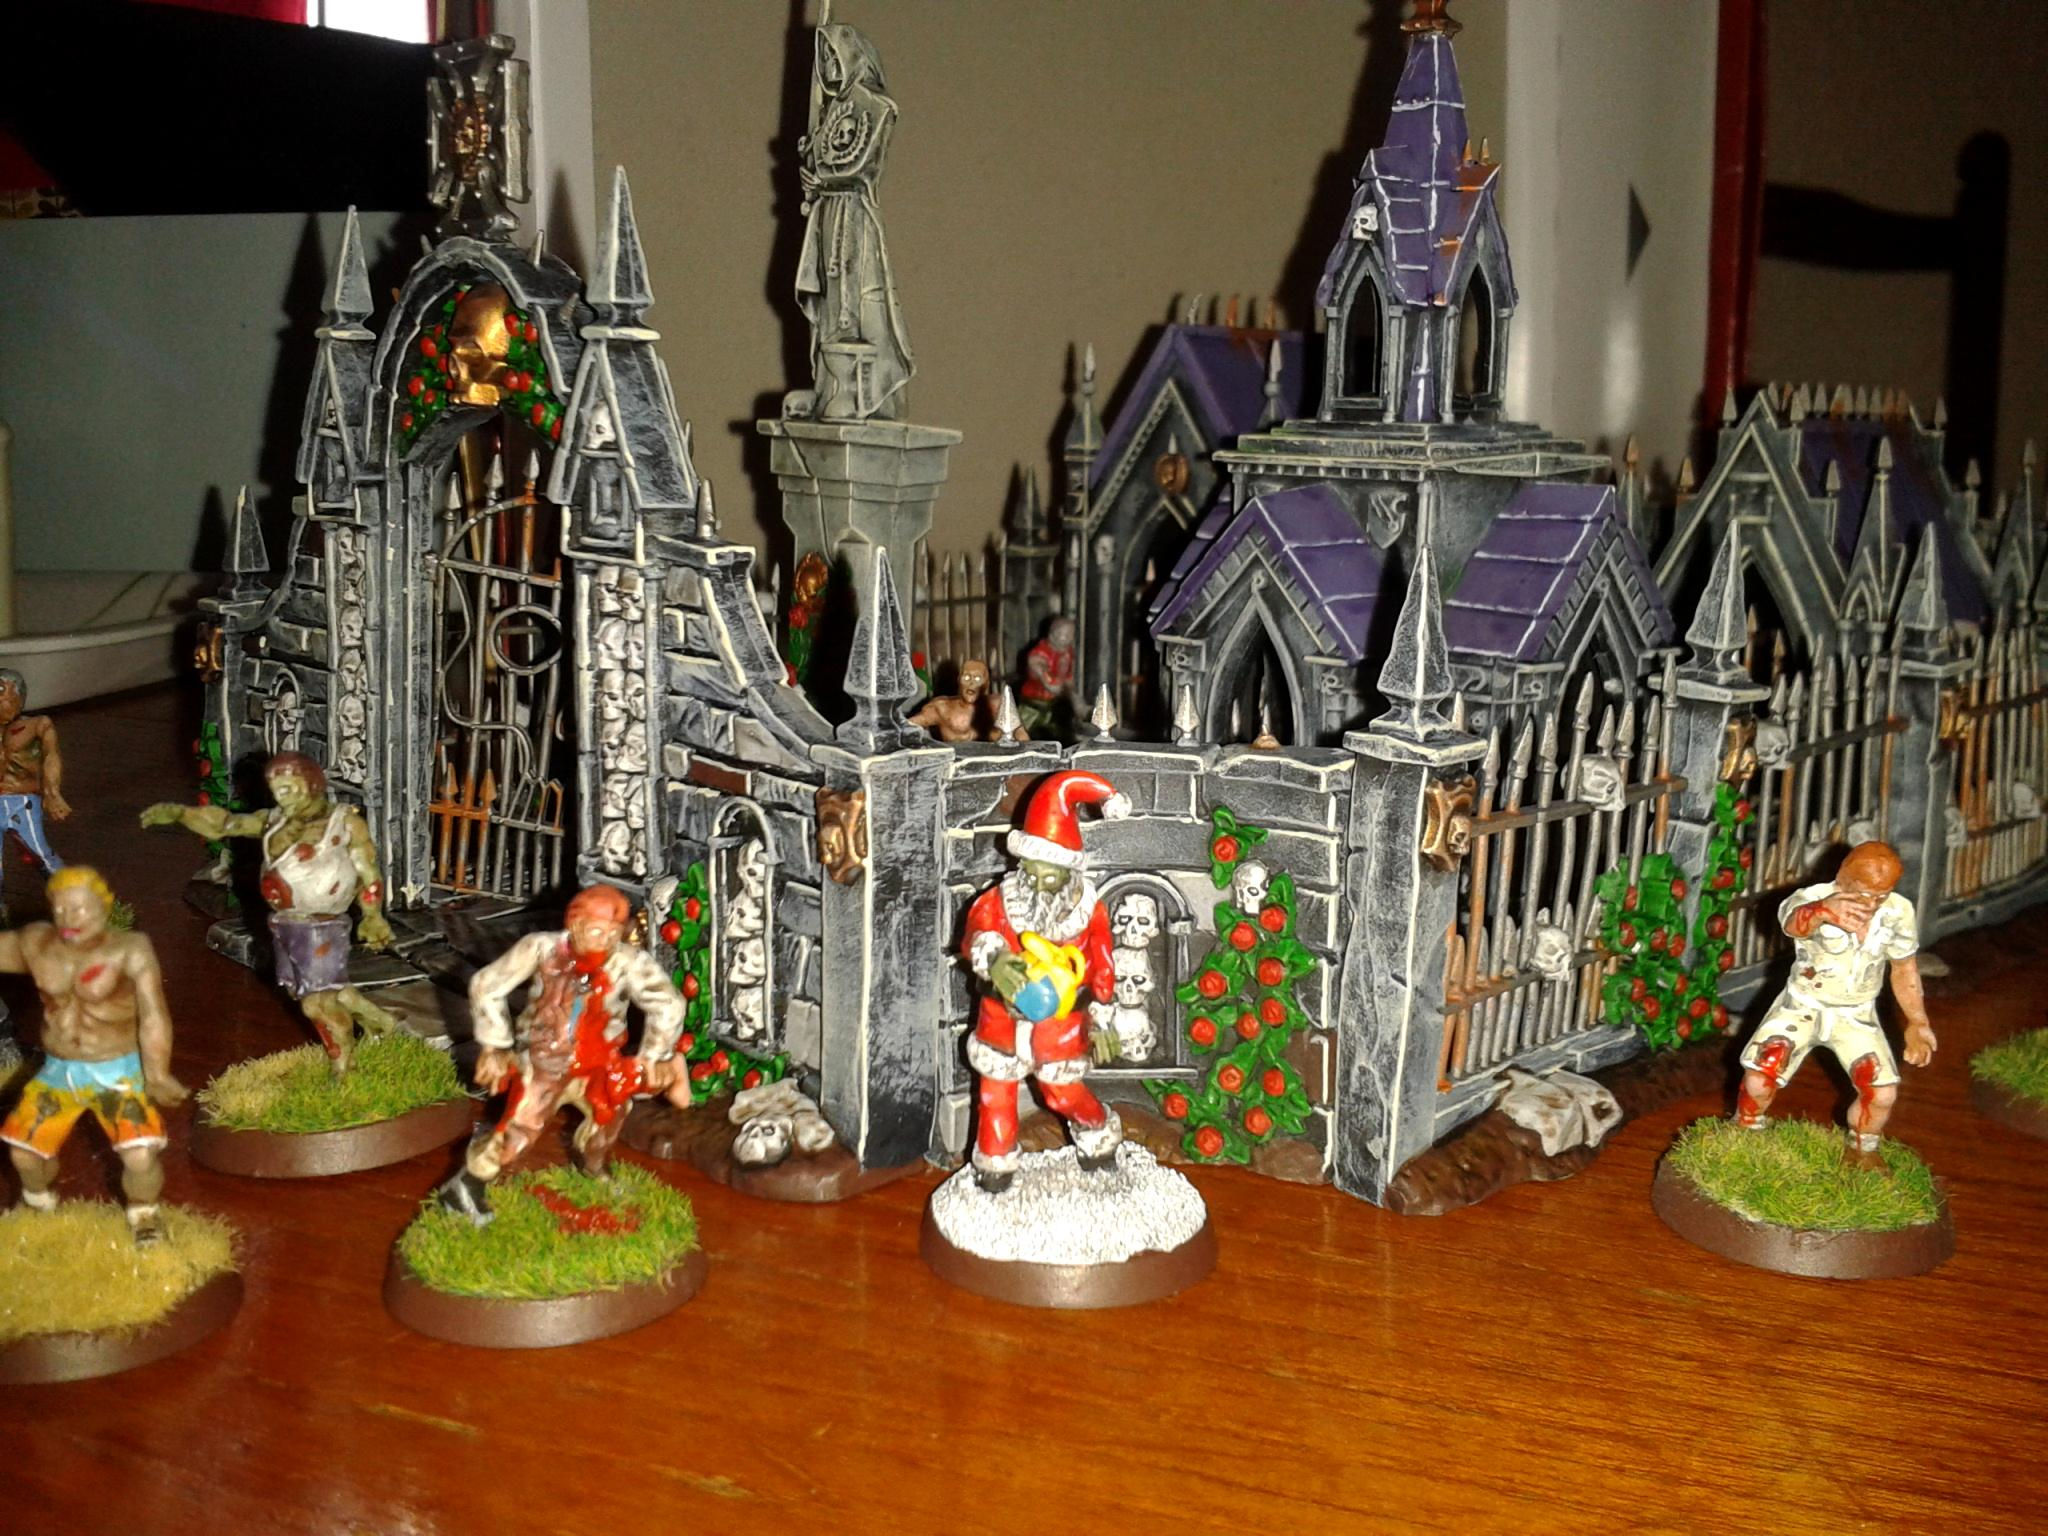 Garden, Morr, Santa Claus, Undead, Zombie